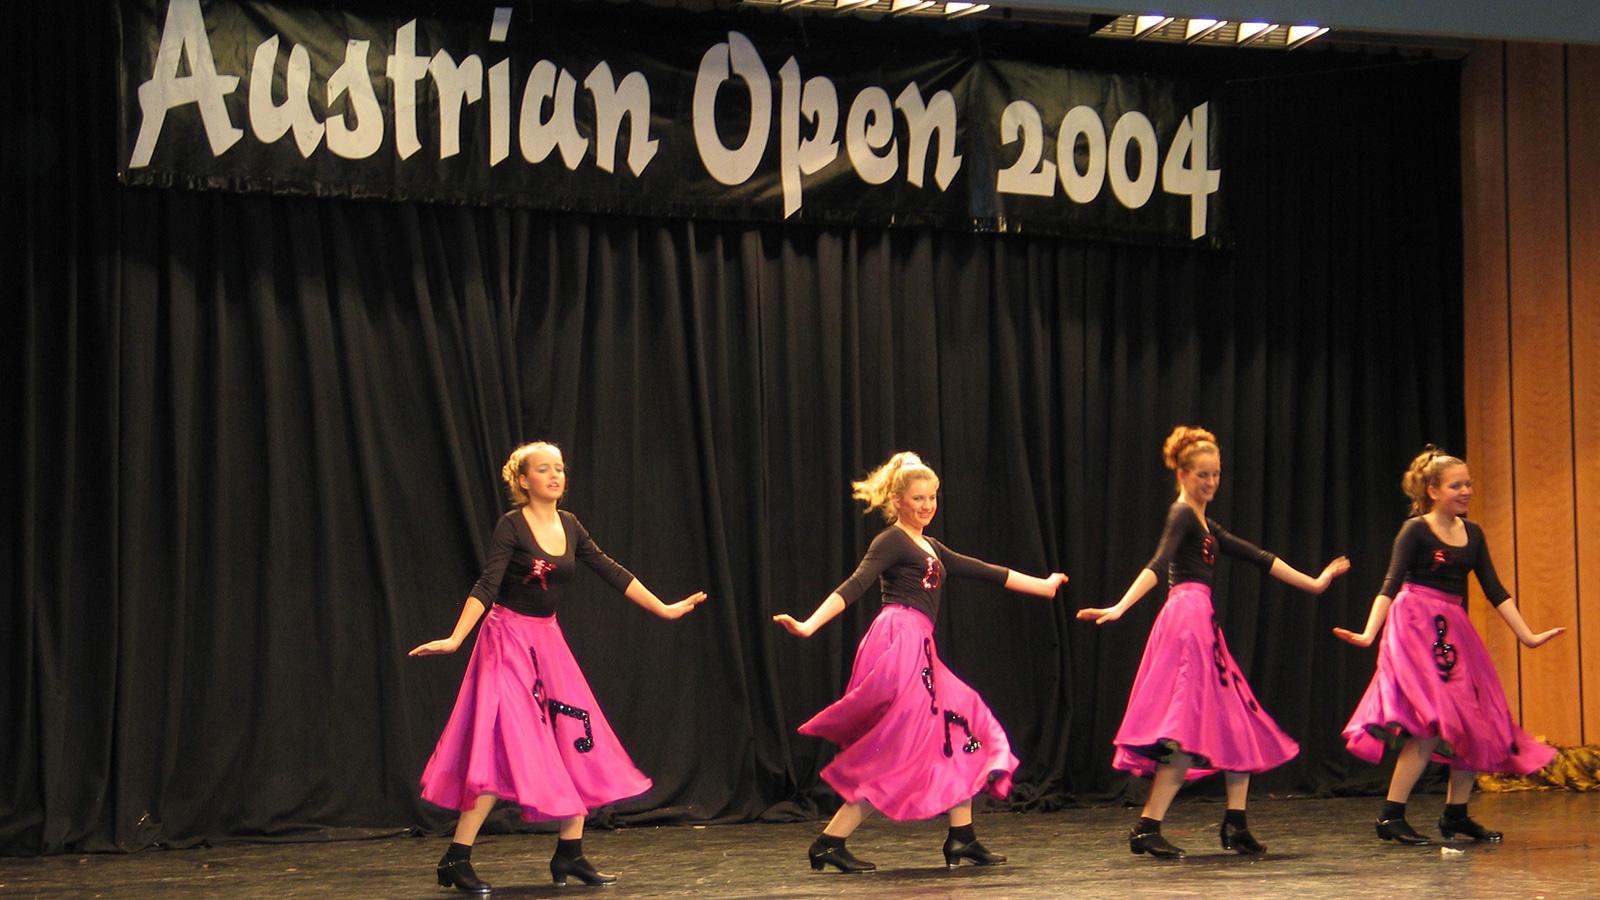 Austrian Open 2004